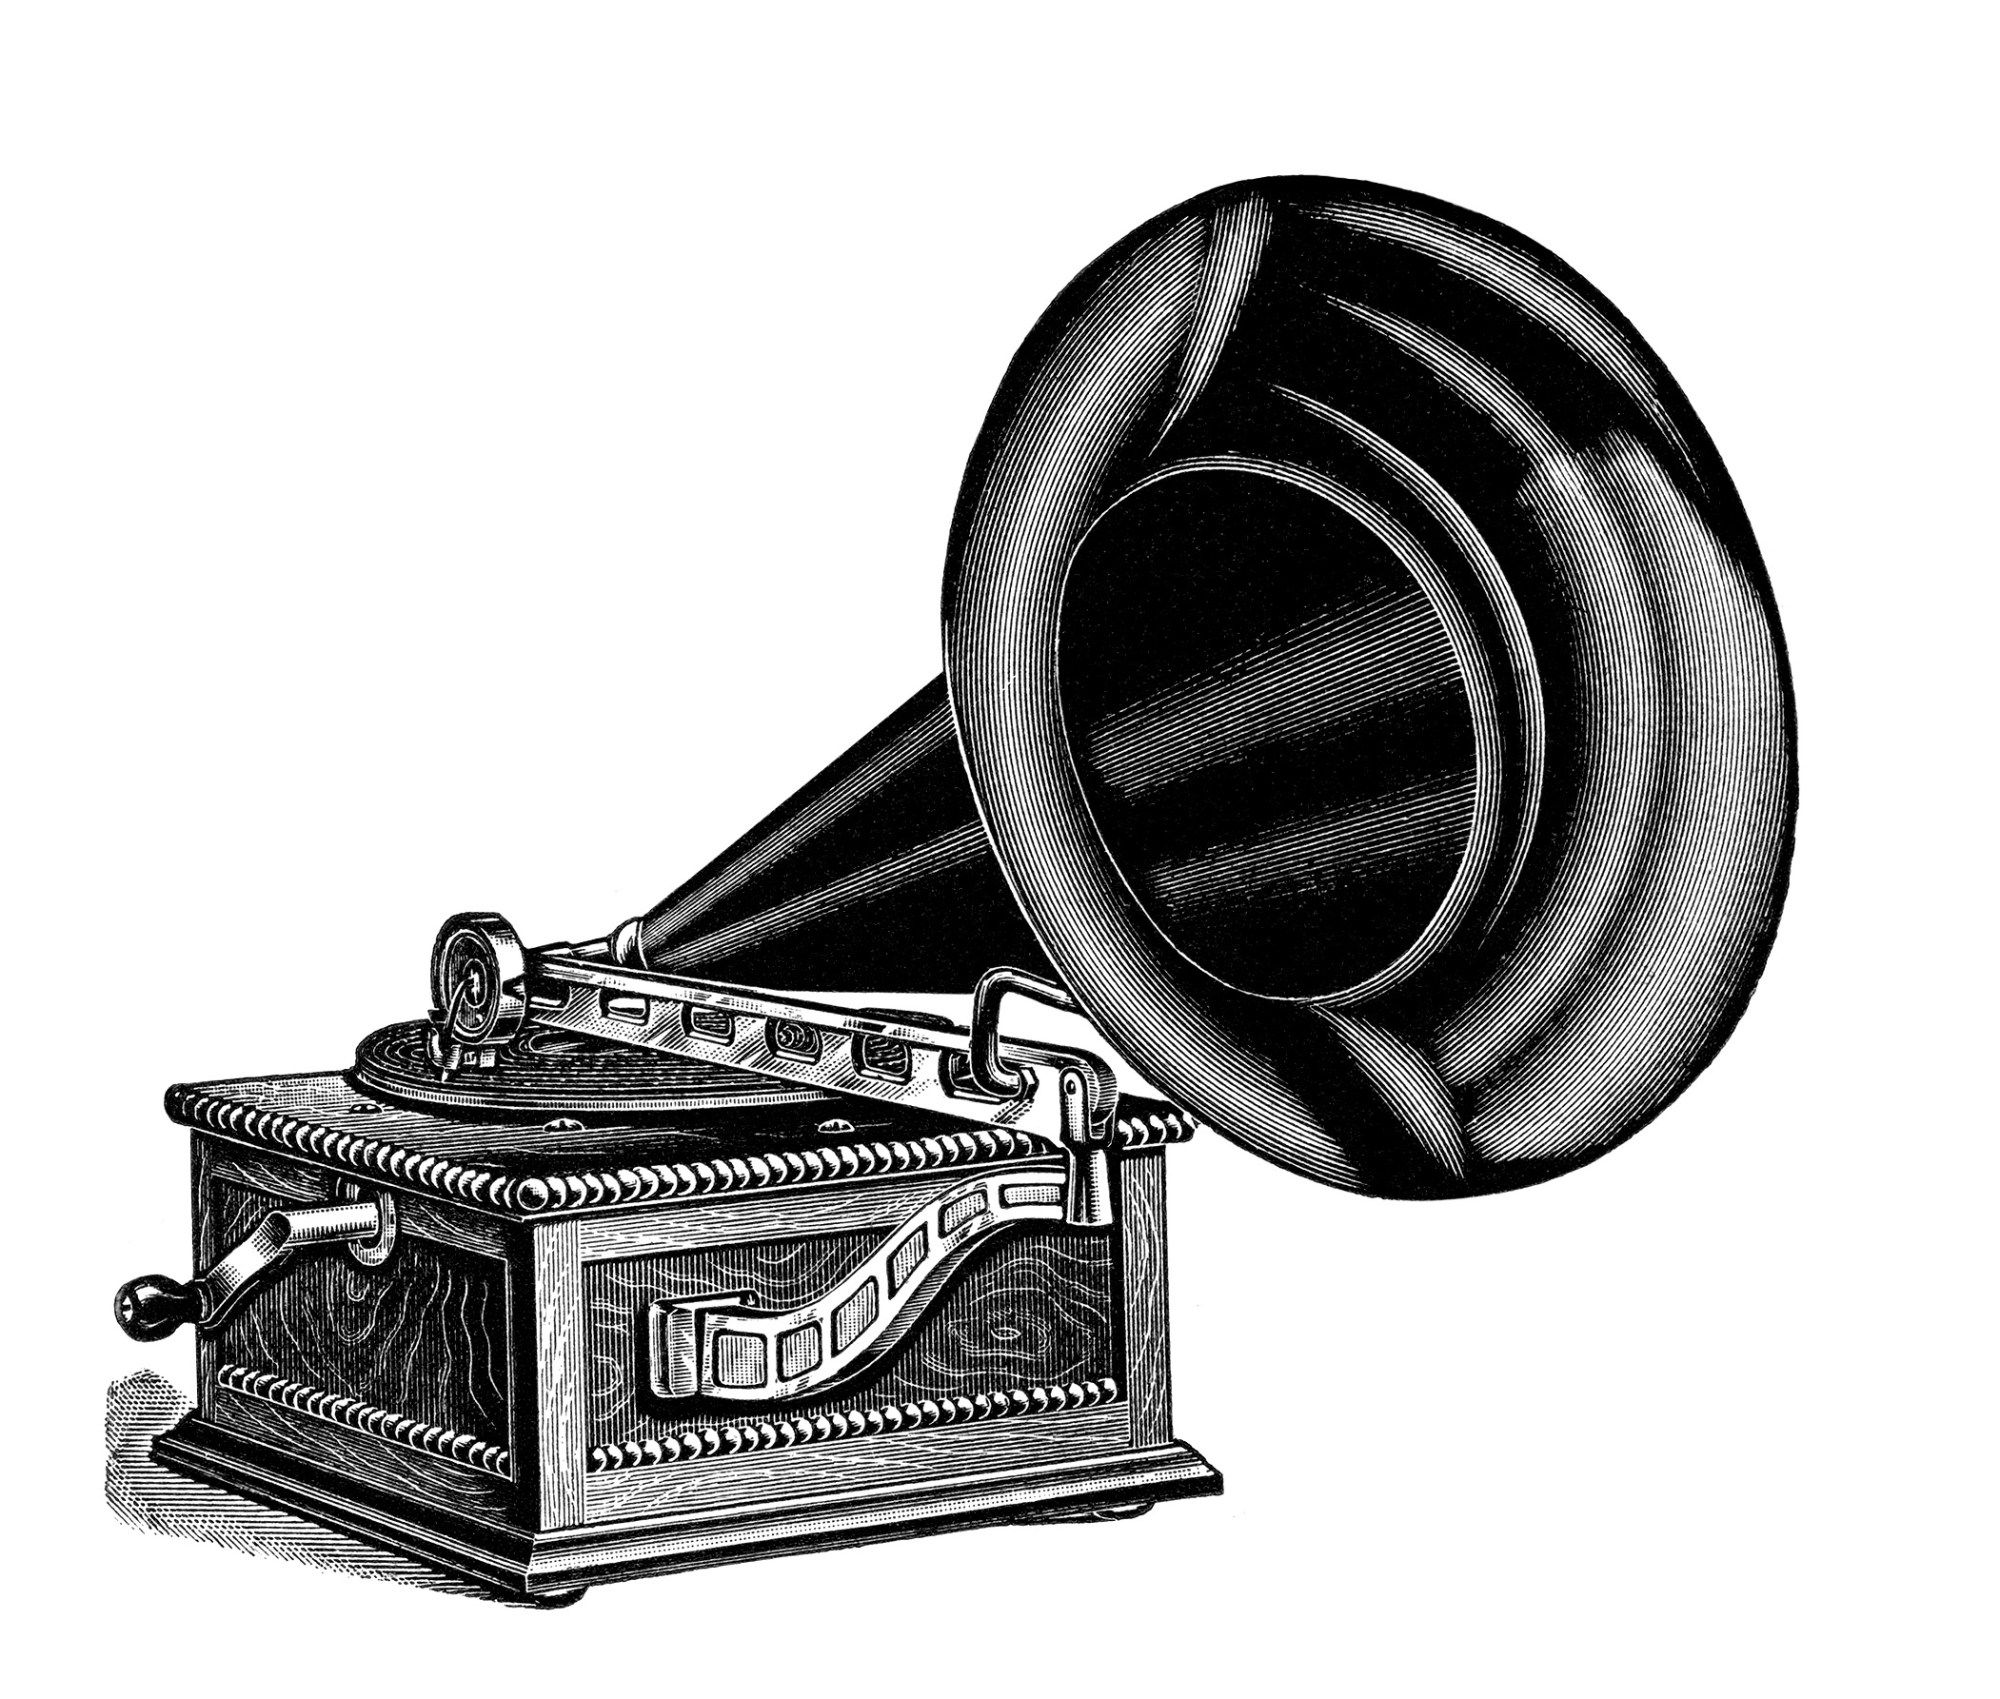 talking machine clip art, vintage gramophone image, black